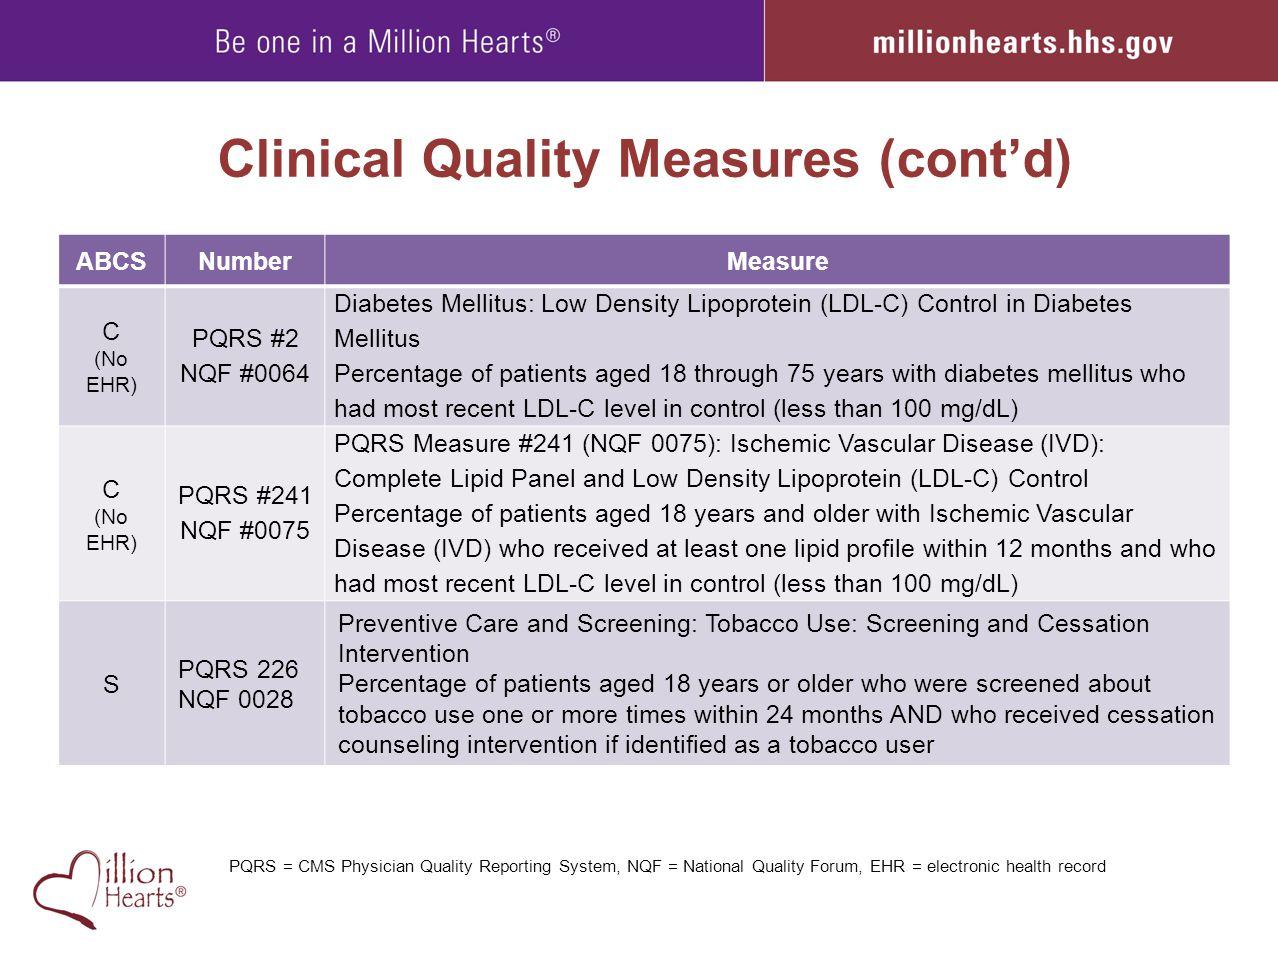 ABCSNumberMeasure C (No EHR) PQRS #2 NQF #0064 Diabetes Mellitus: Low Density Lipoprotein (LDL-C) Control in Diabetes Mellitus Percentage of patients